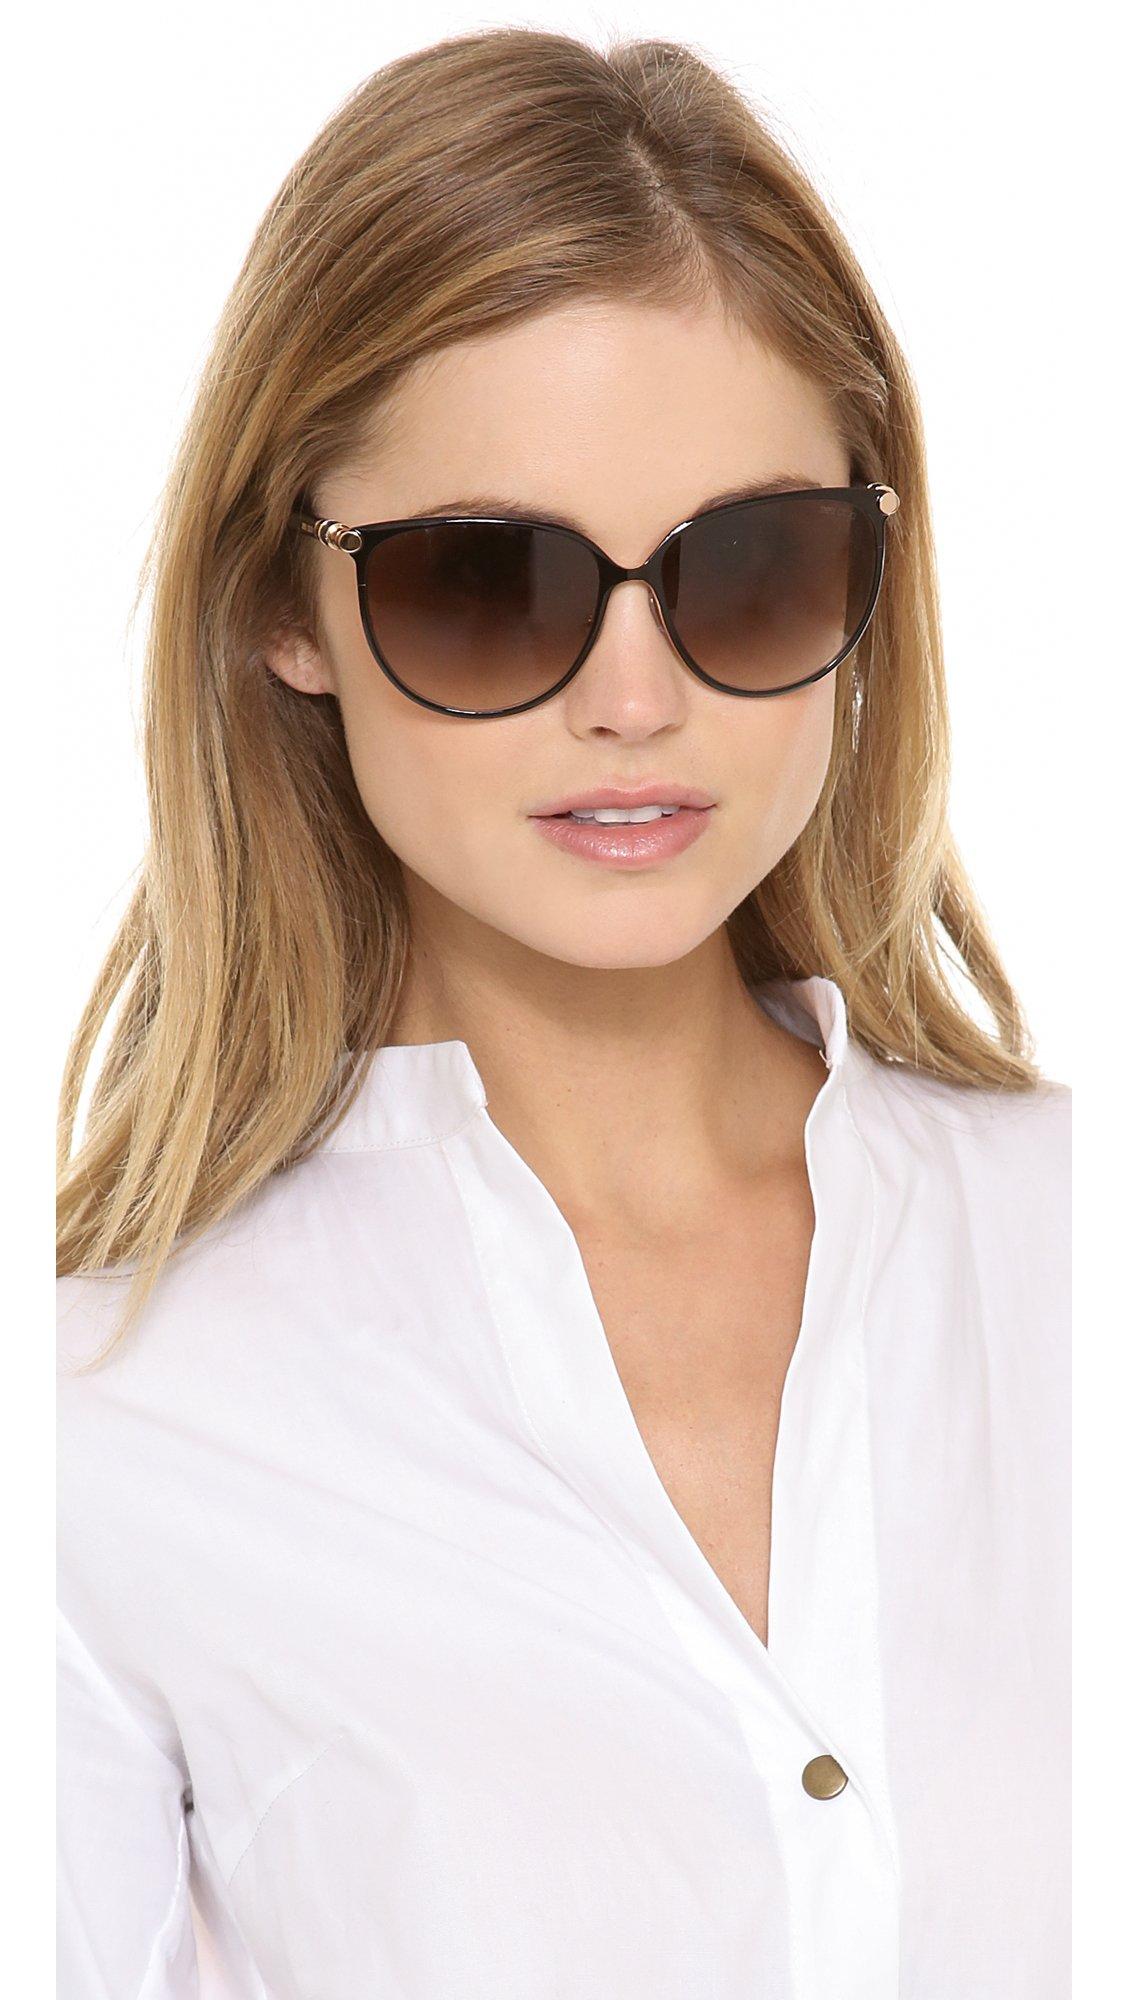 3af6d04459 Jimmy Choo Juliet Sunglasses - Shiny Black Brown Gradient in Black ...